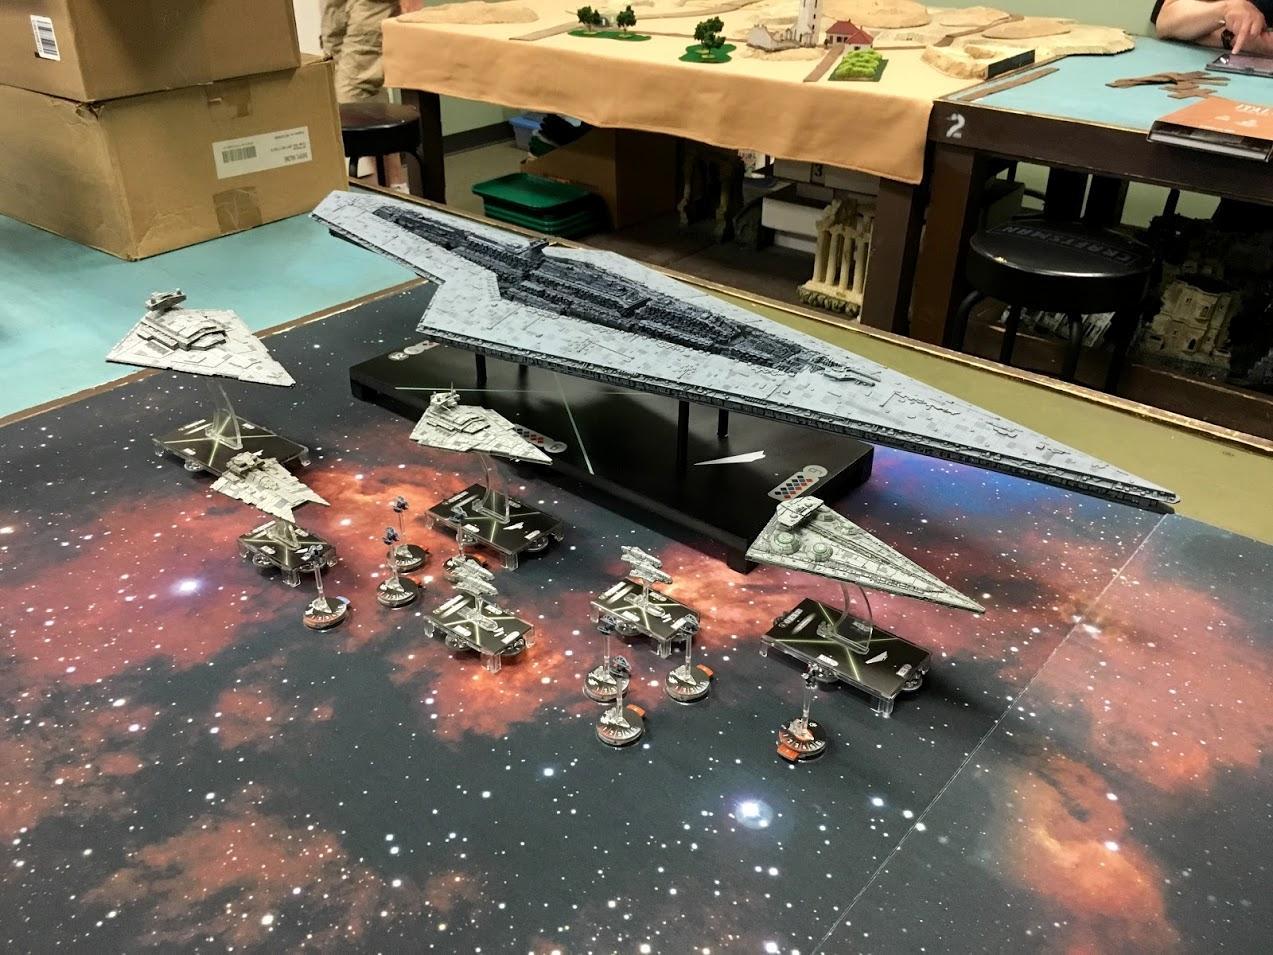 Armada, Big, Empire, Huge, Star Destroyer, Star Wars, Super Star Destroyer, X-Wing